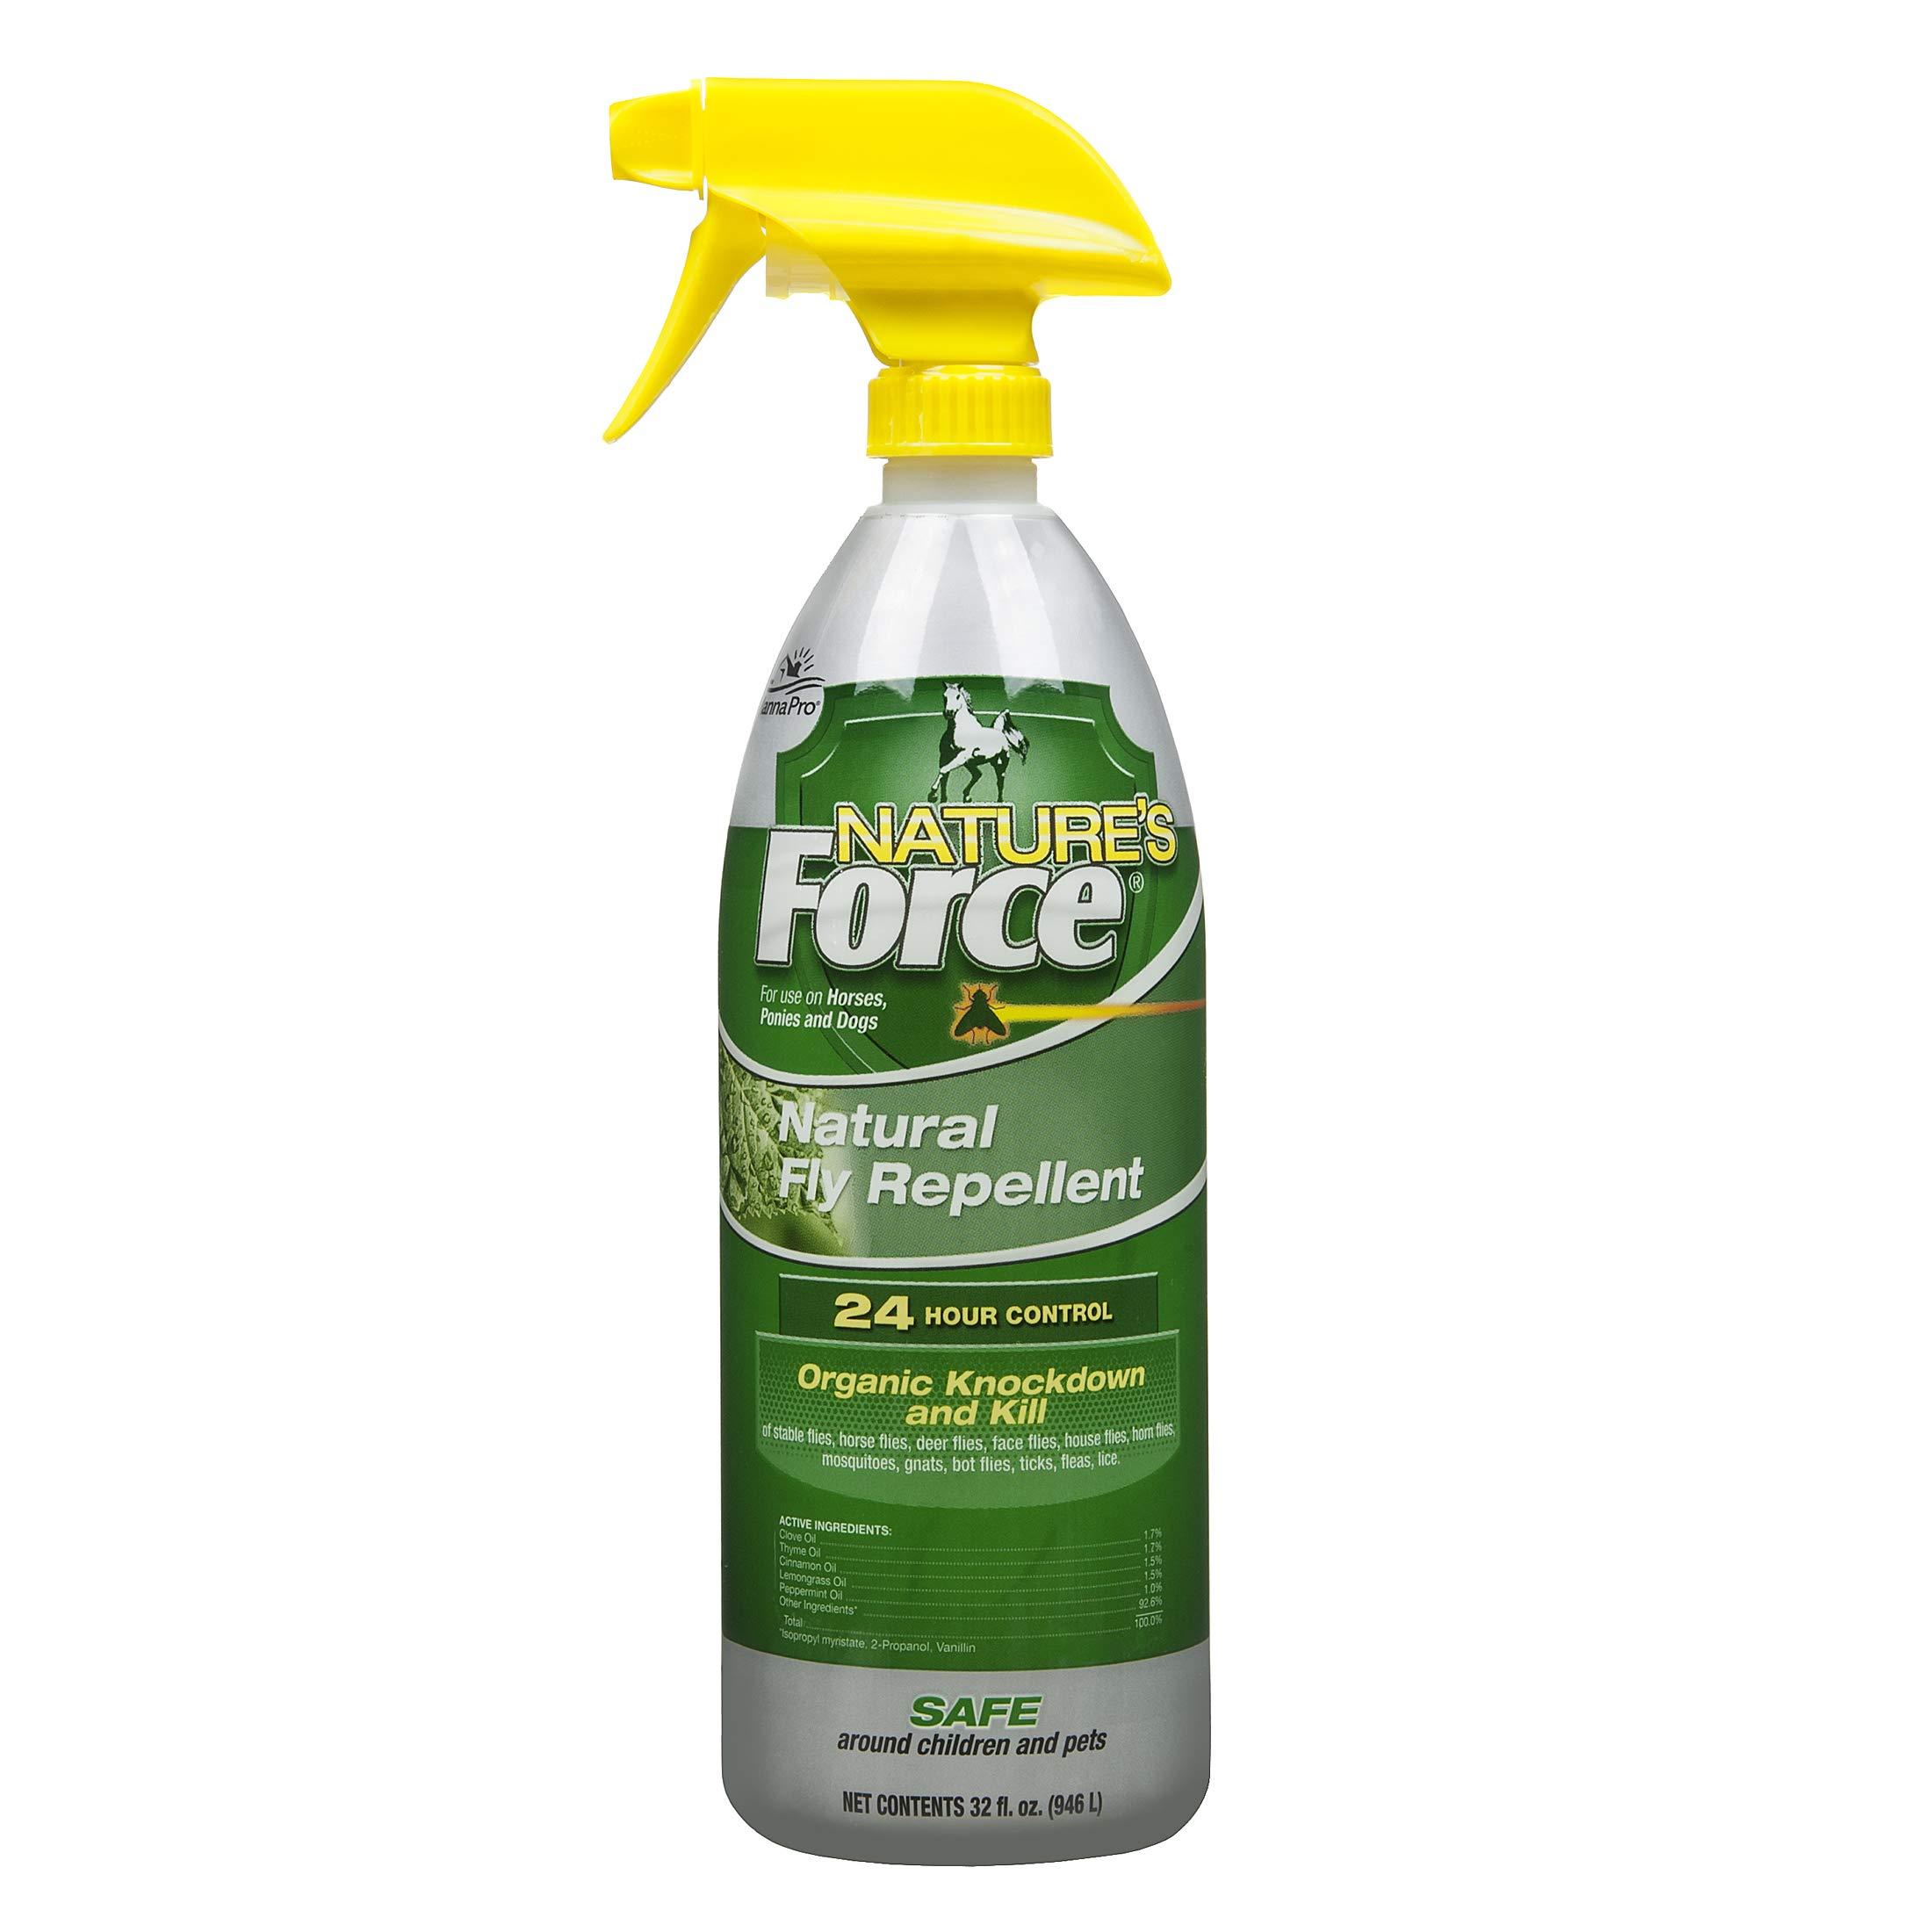 Manna Pro 667785 Nature's Force Fly Spray, 32 Oz, 1 Quart